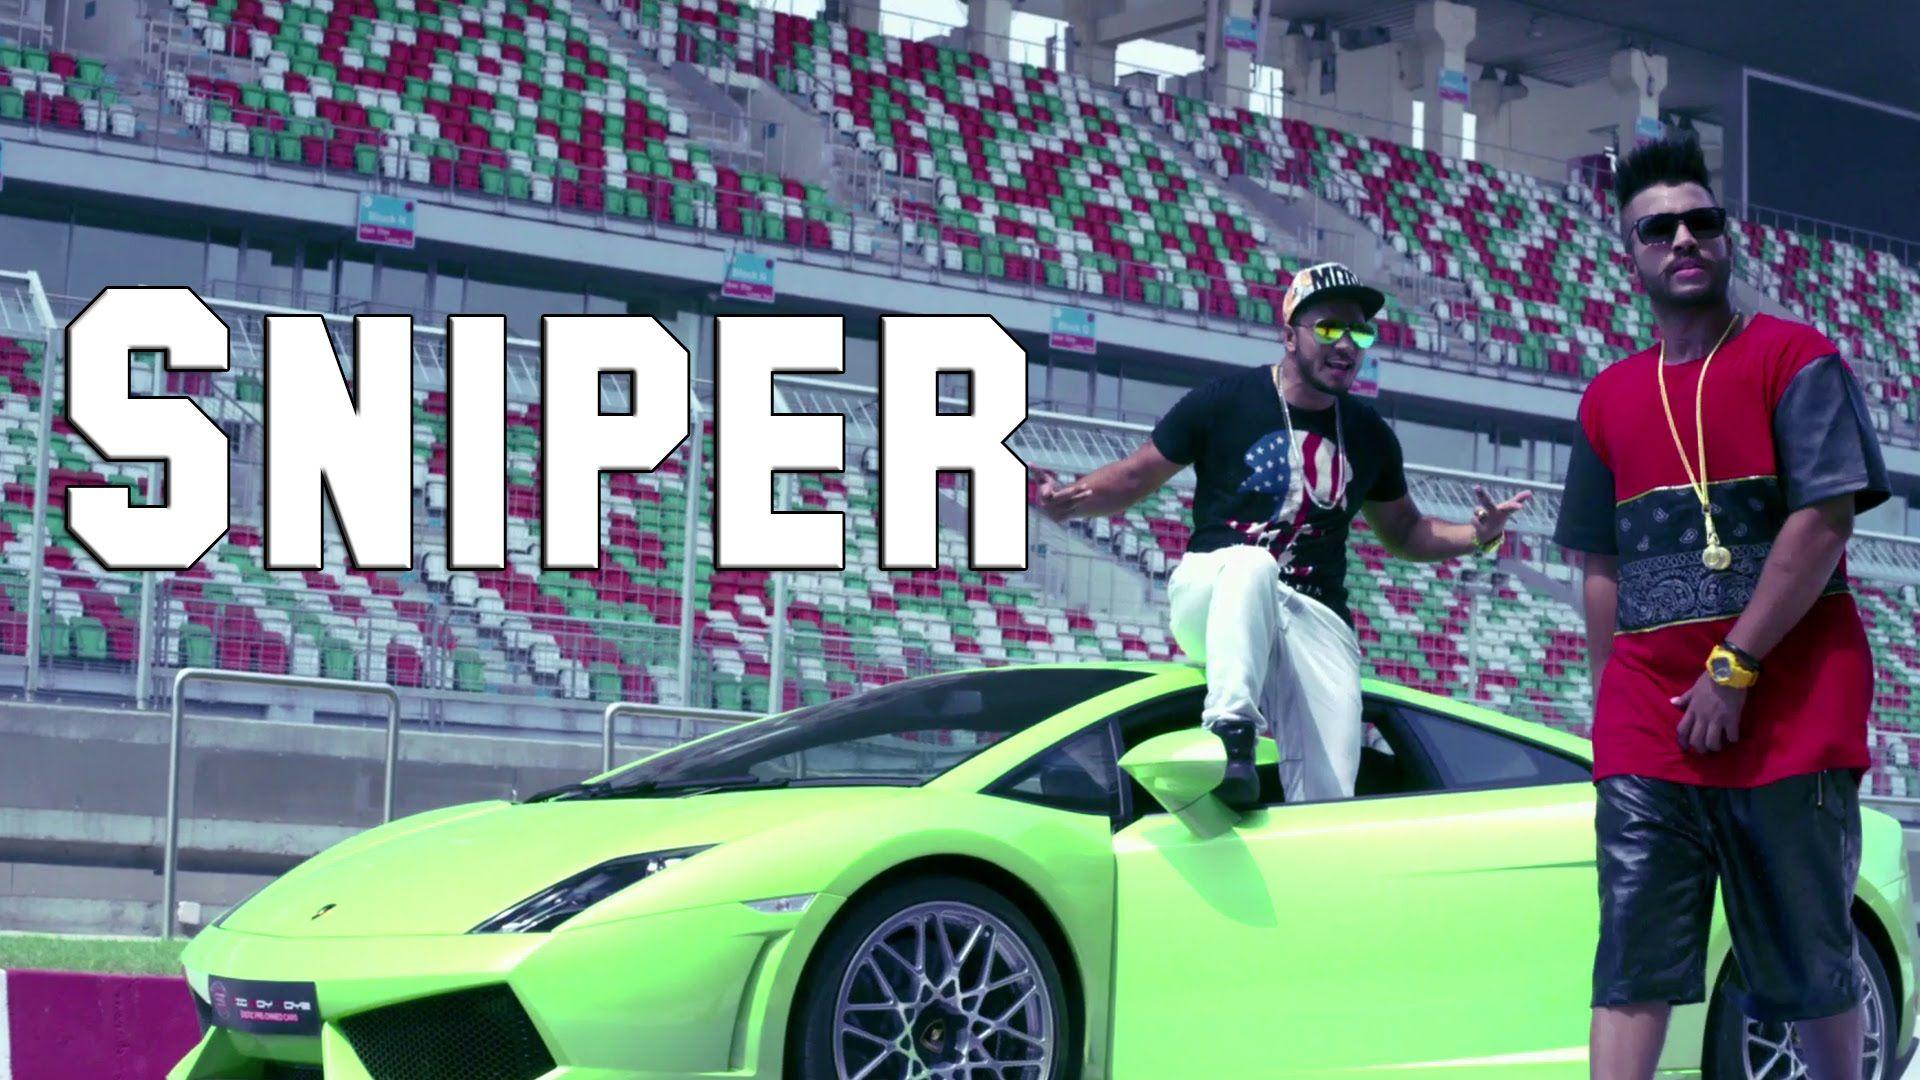 Sniper muzical doctorz sukhe feat raftaar latest punjabi song 2014